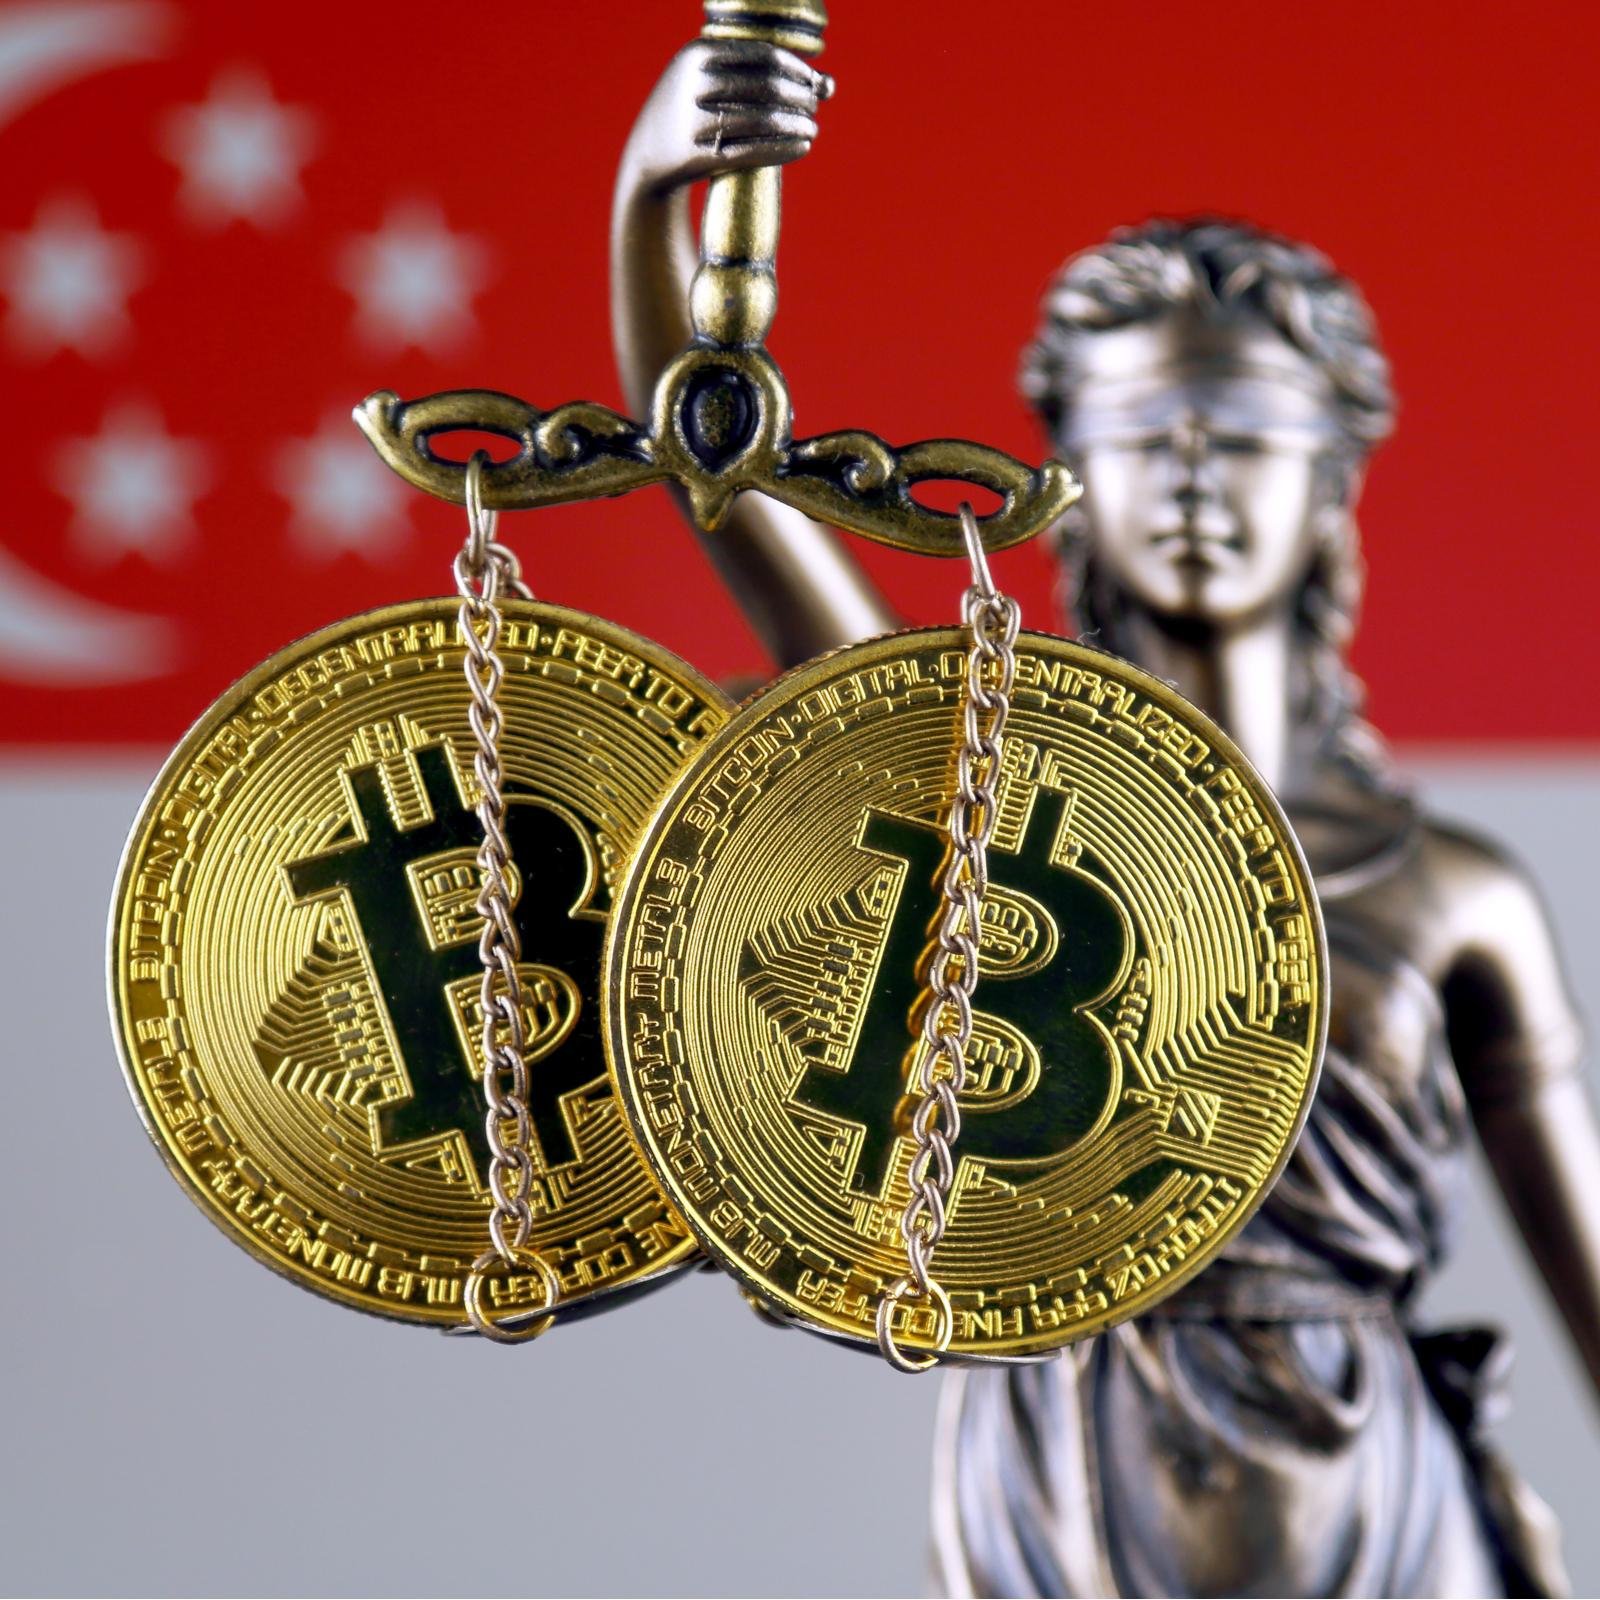 Singapore Financial Regulator Updates Guide to Digital Token Offerings